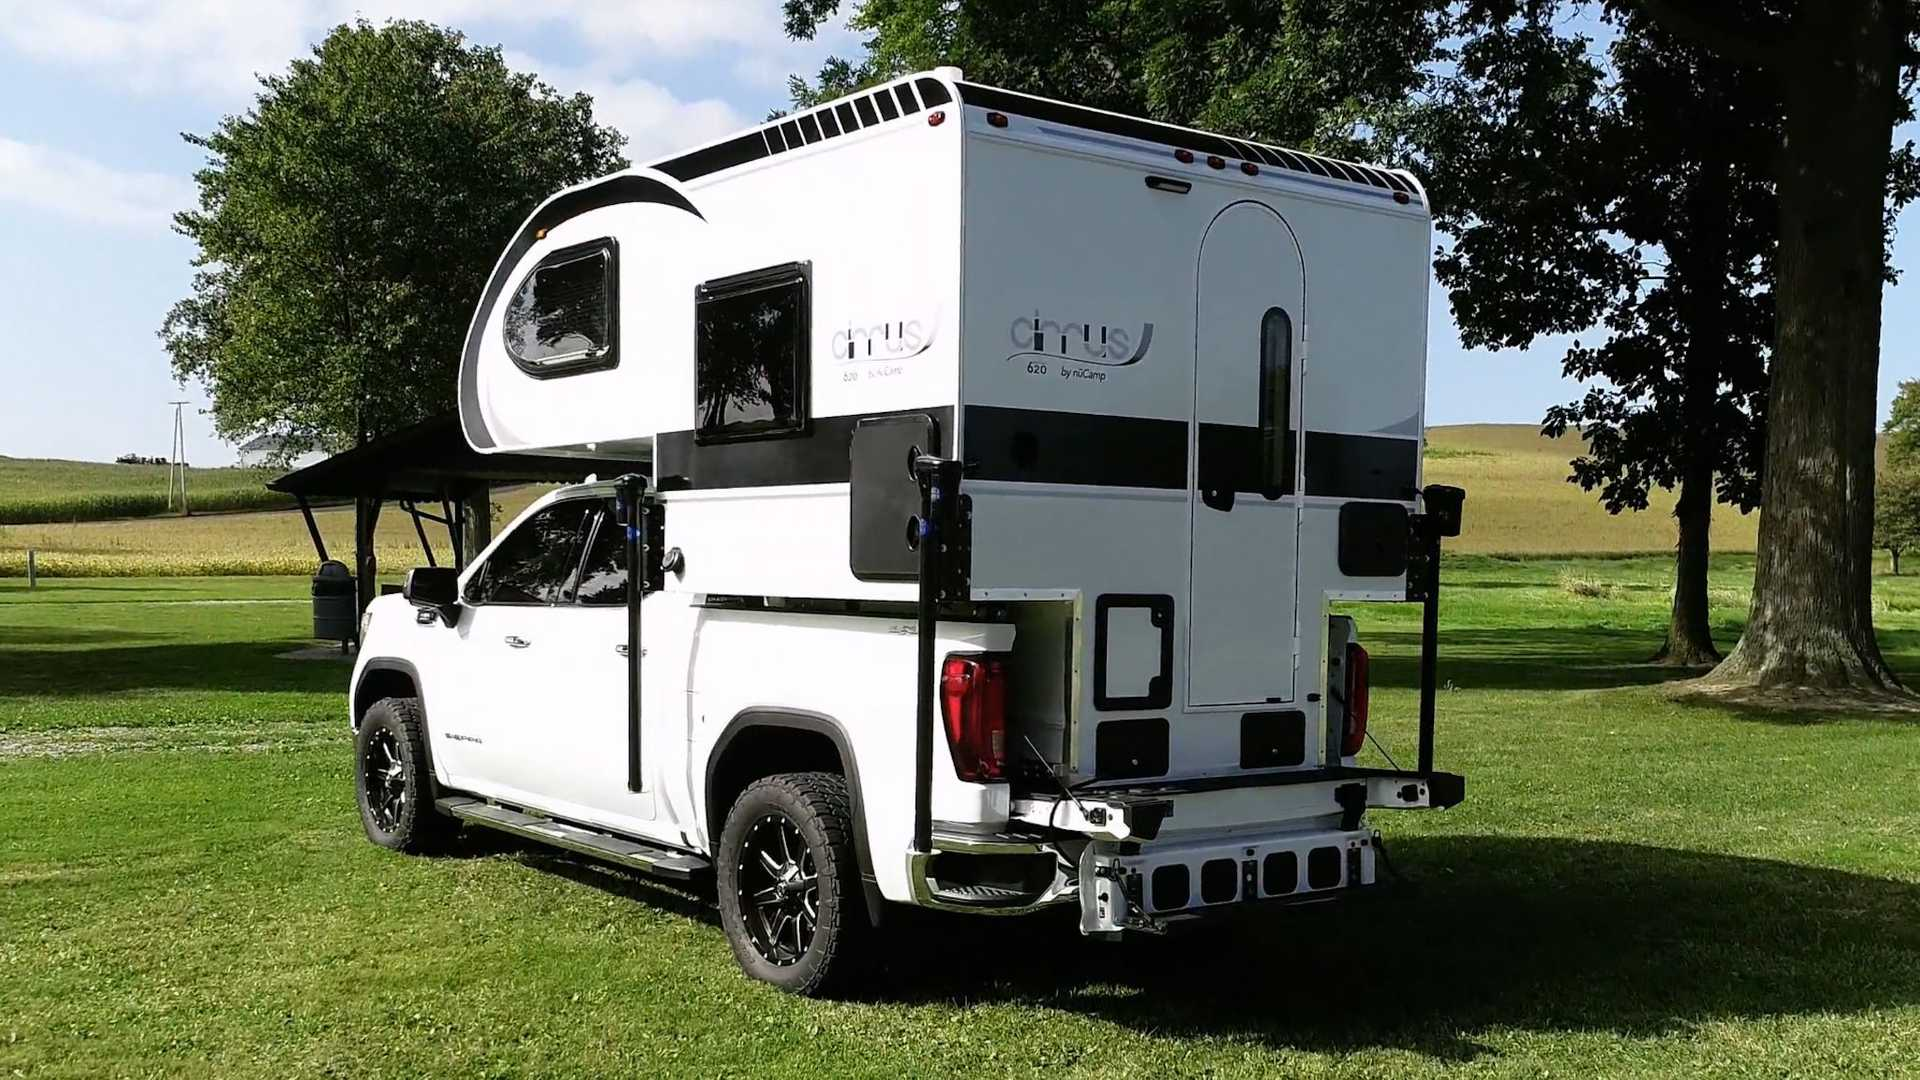 NuCamp Cirrus 620 Truck Camper Revealed For Half-Ton Trucks